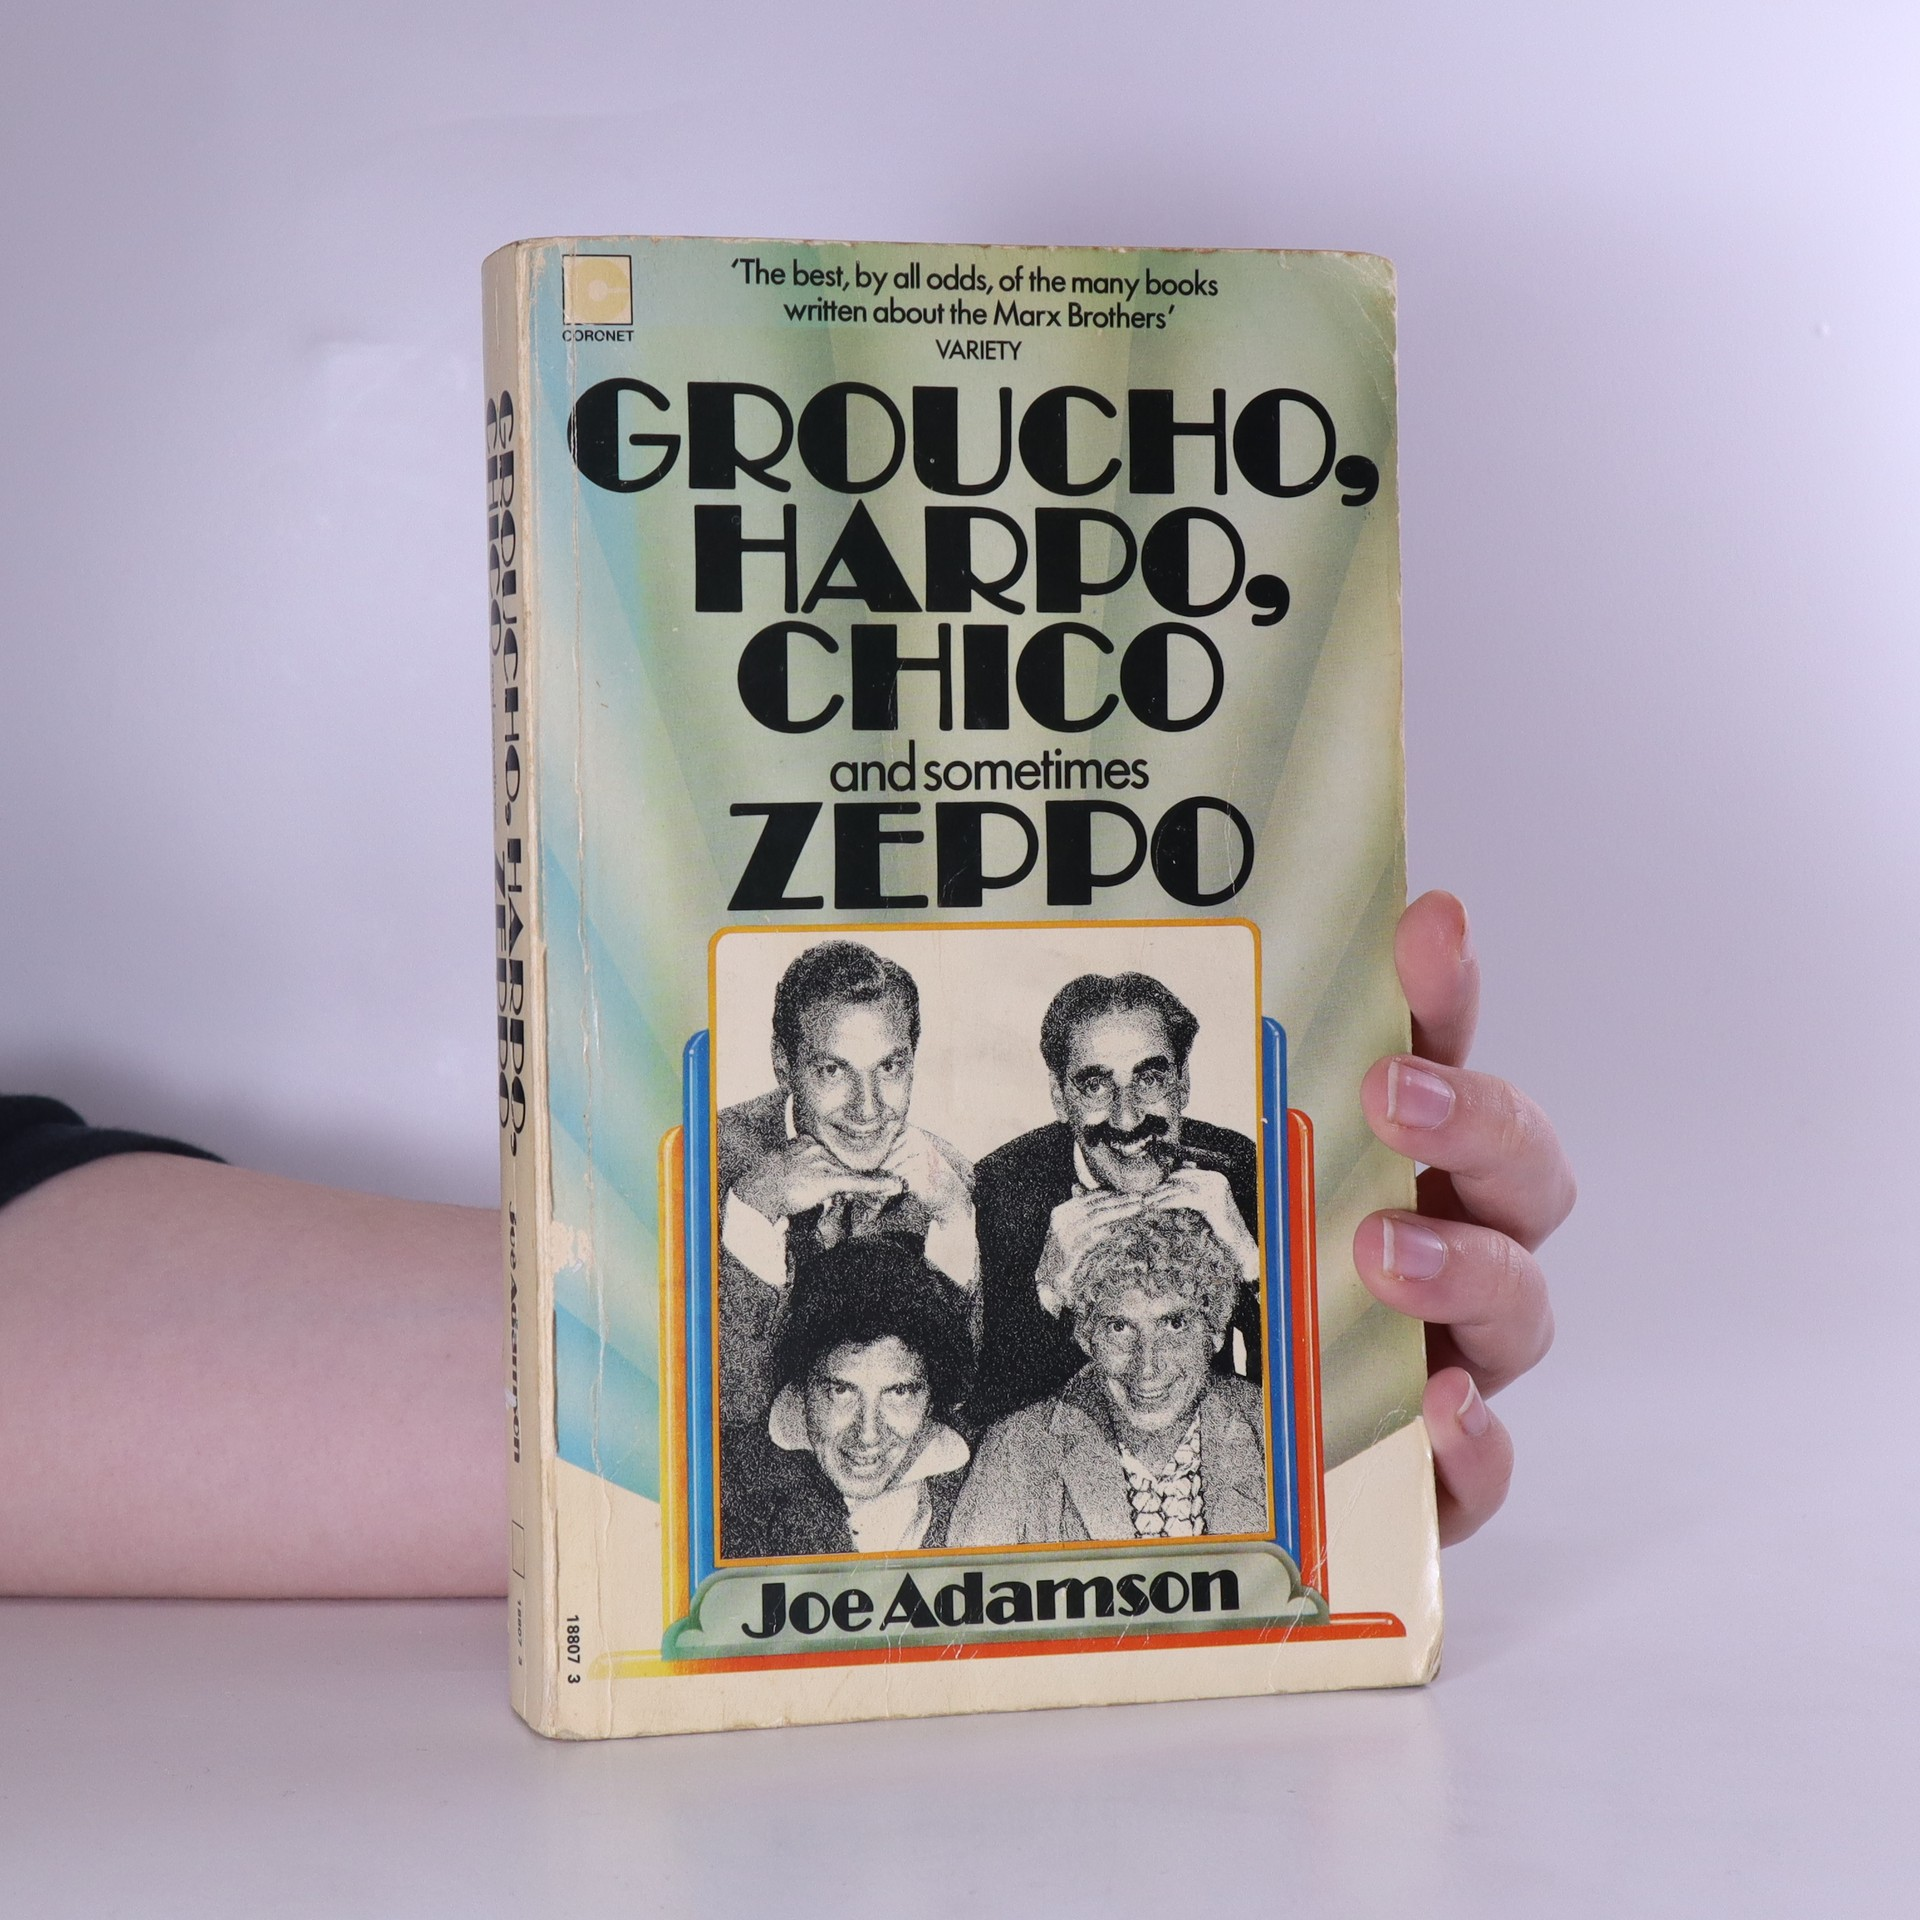 antikvární kniha Groucho, Harpo, Chico and sometimes Zeppo, 1974